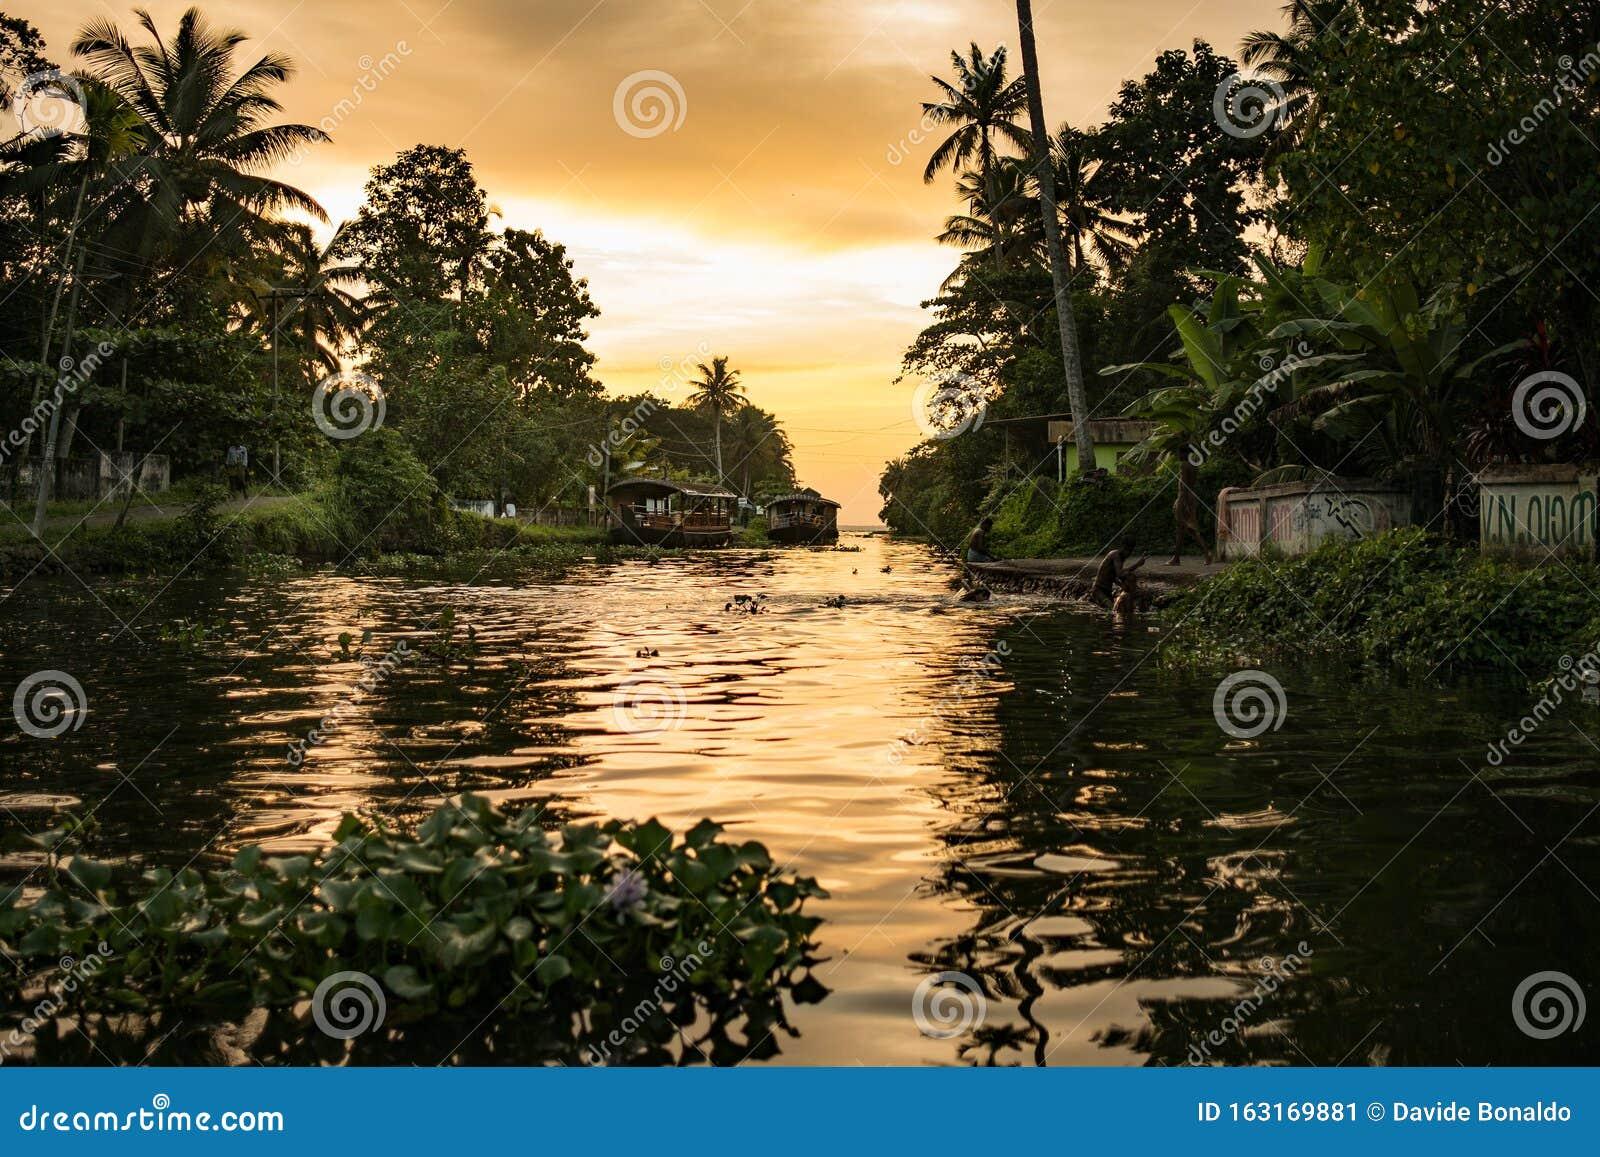 4 080 Kerala Scenery Photos Free Royalty Free Stock Photos From Dreamstime